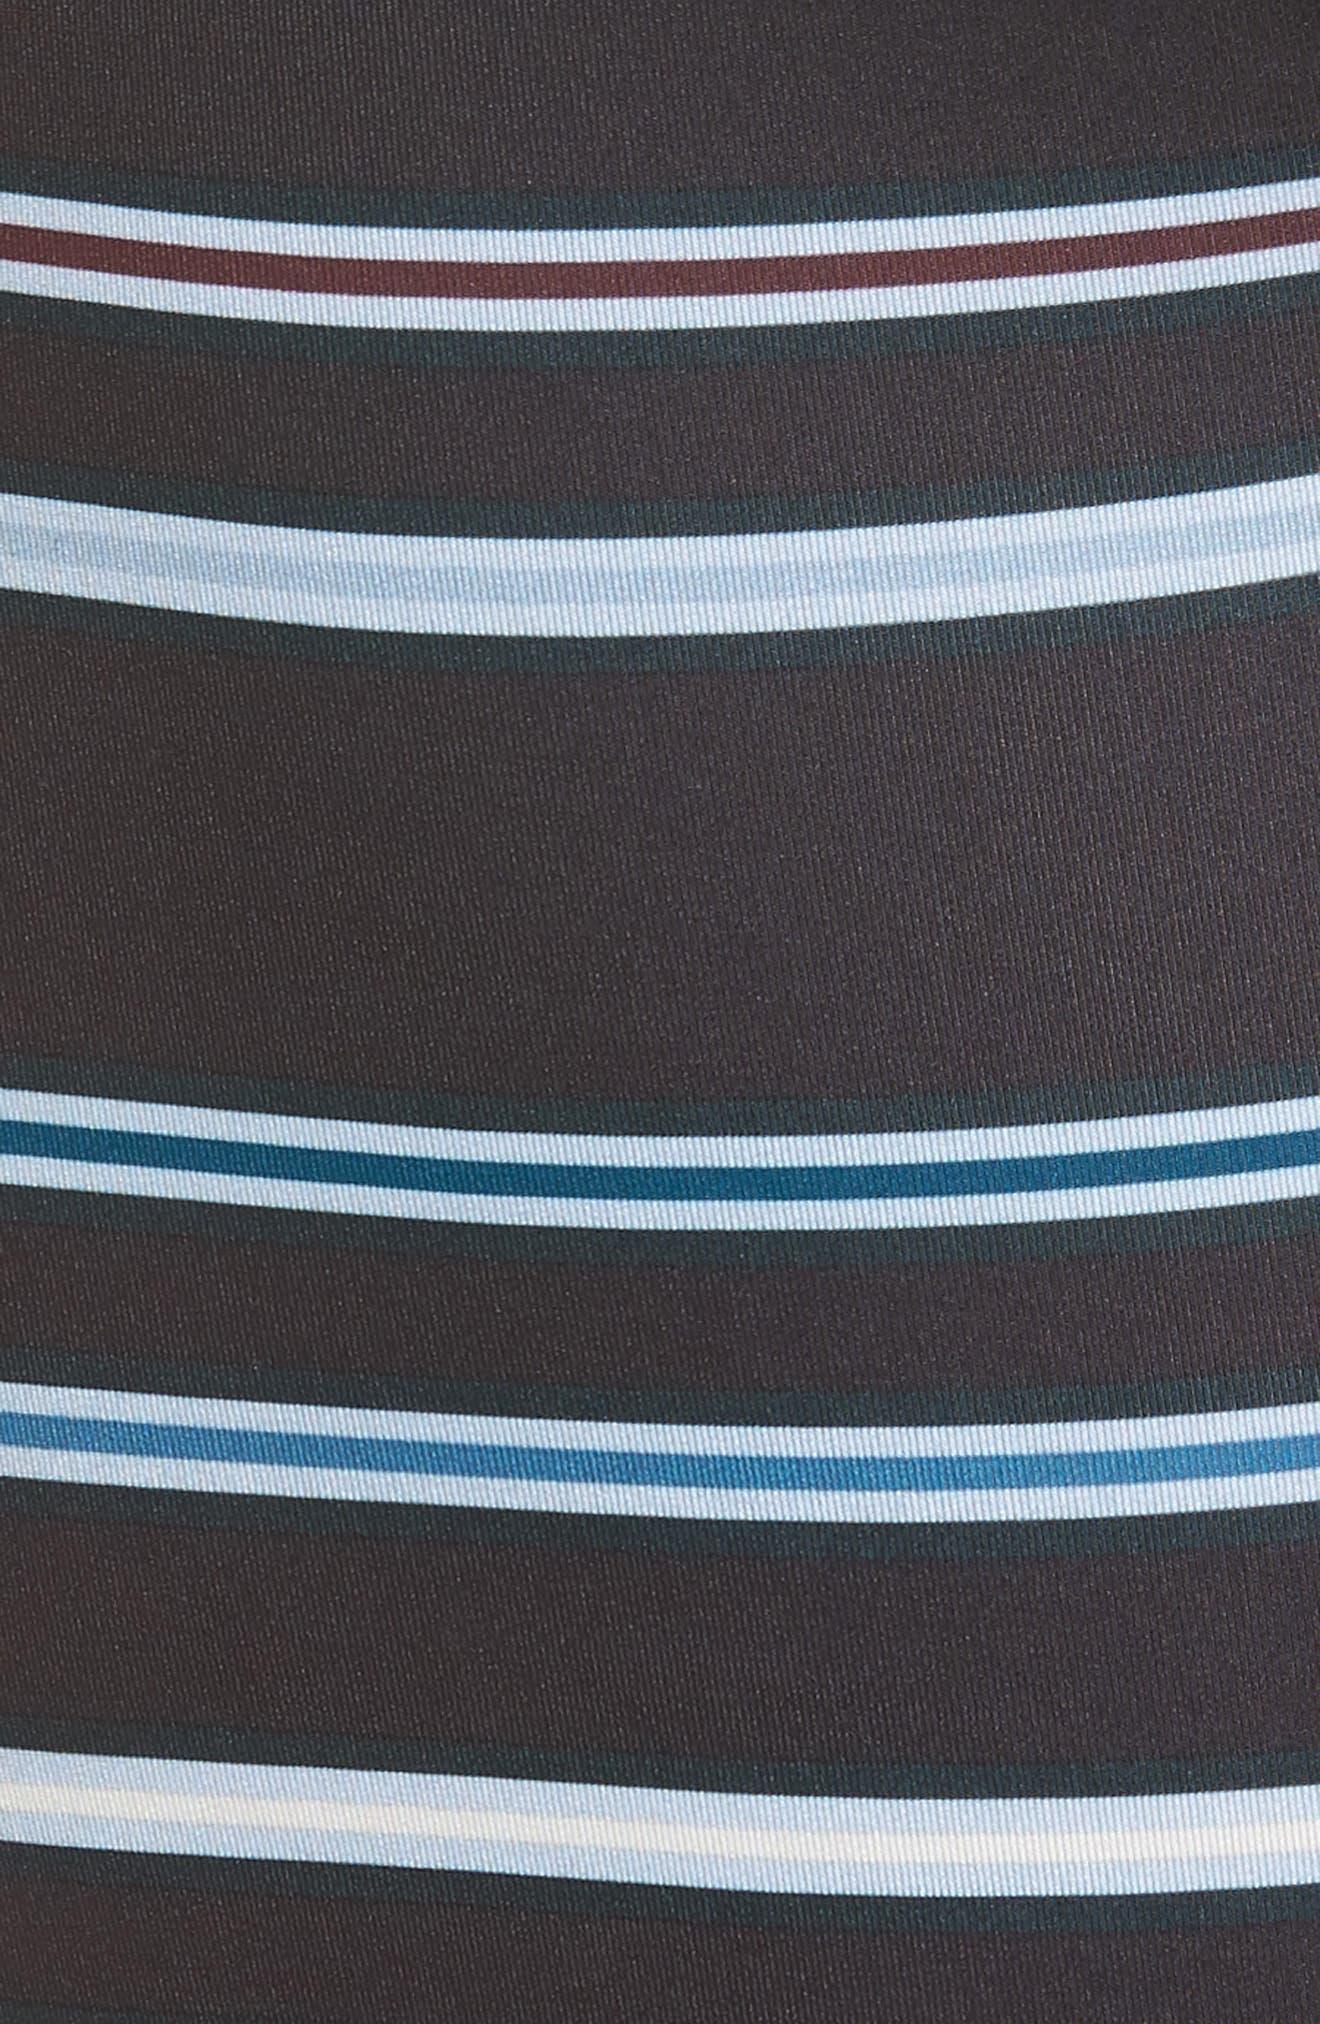 Beyond Striped Boxer Briefs,                             Alternate thumbnail 3, color,                             Black